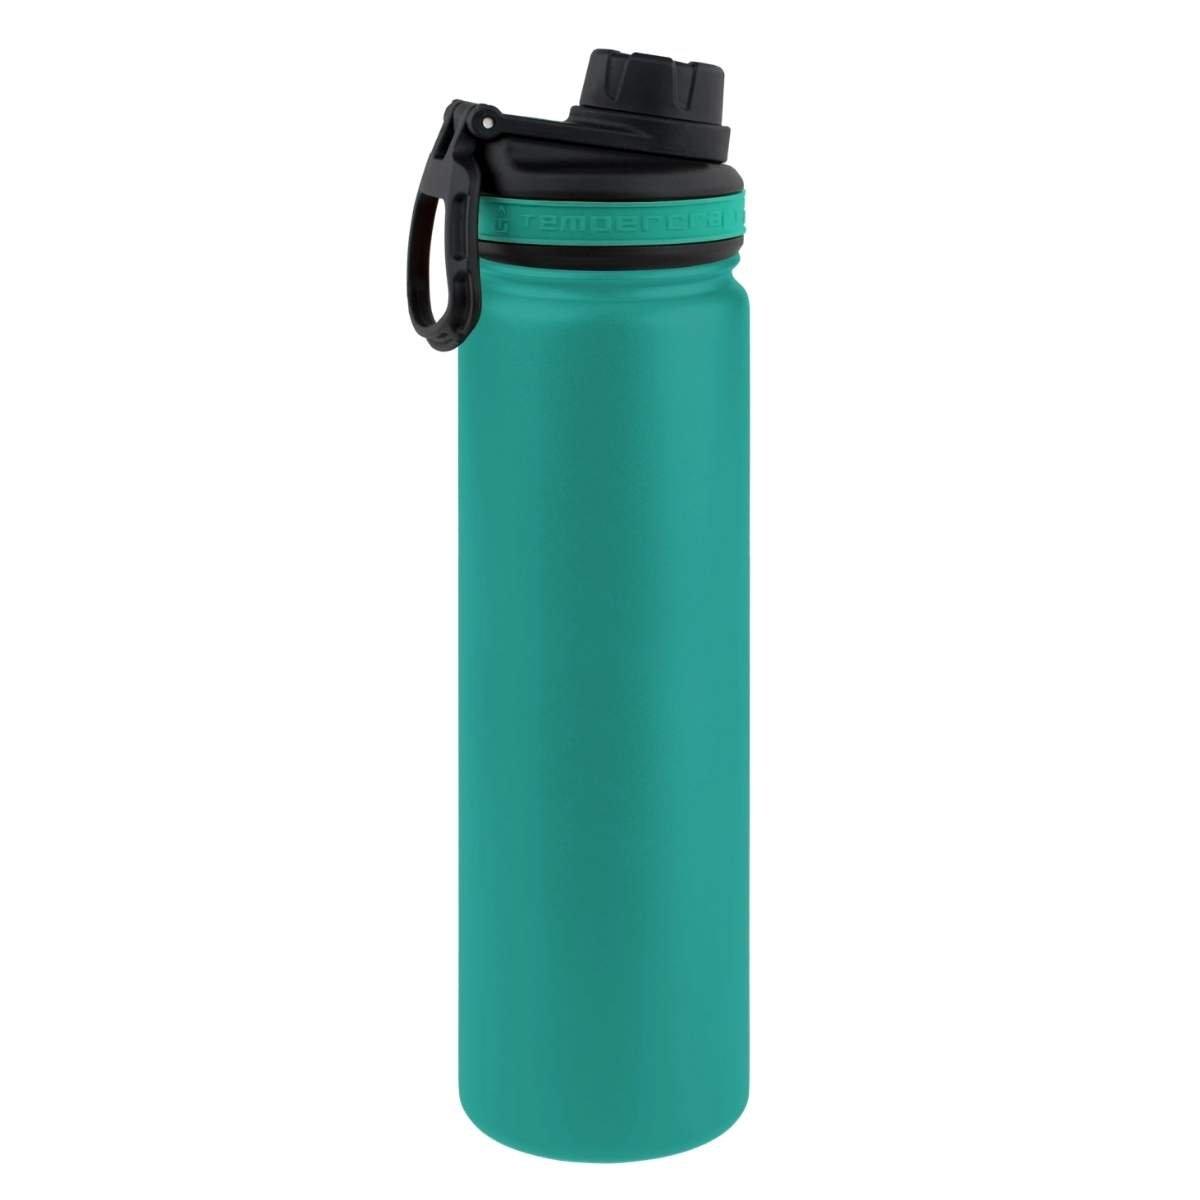 Tempercraft 22 oz. Water Bottle